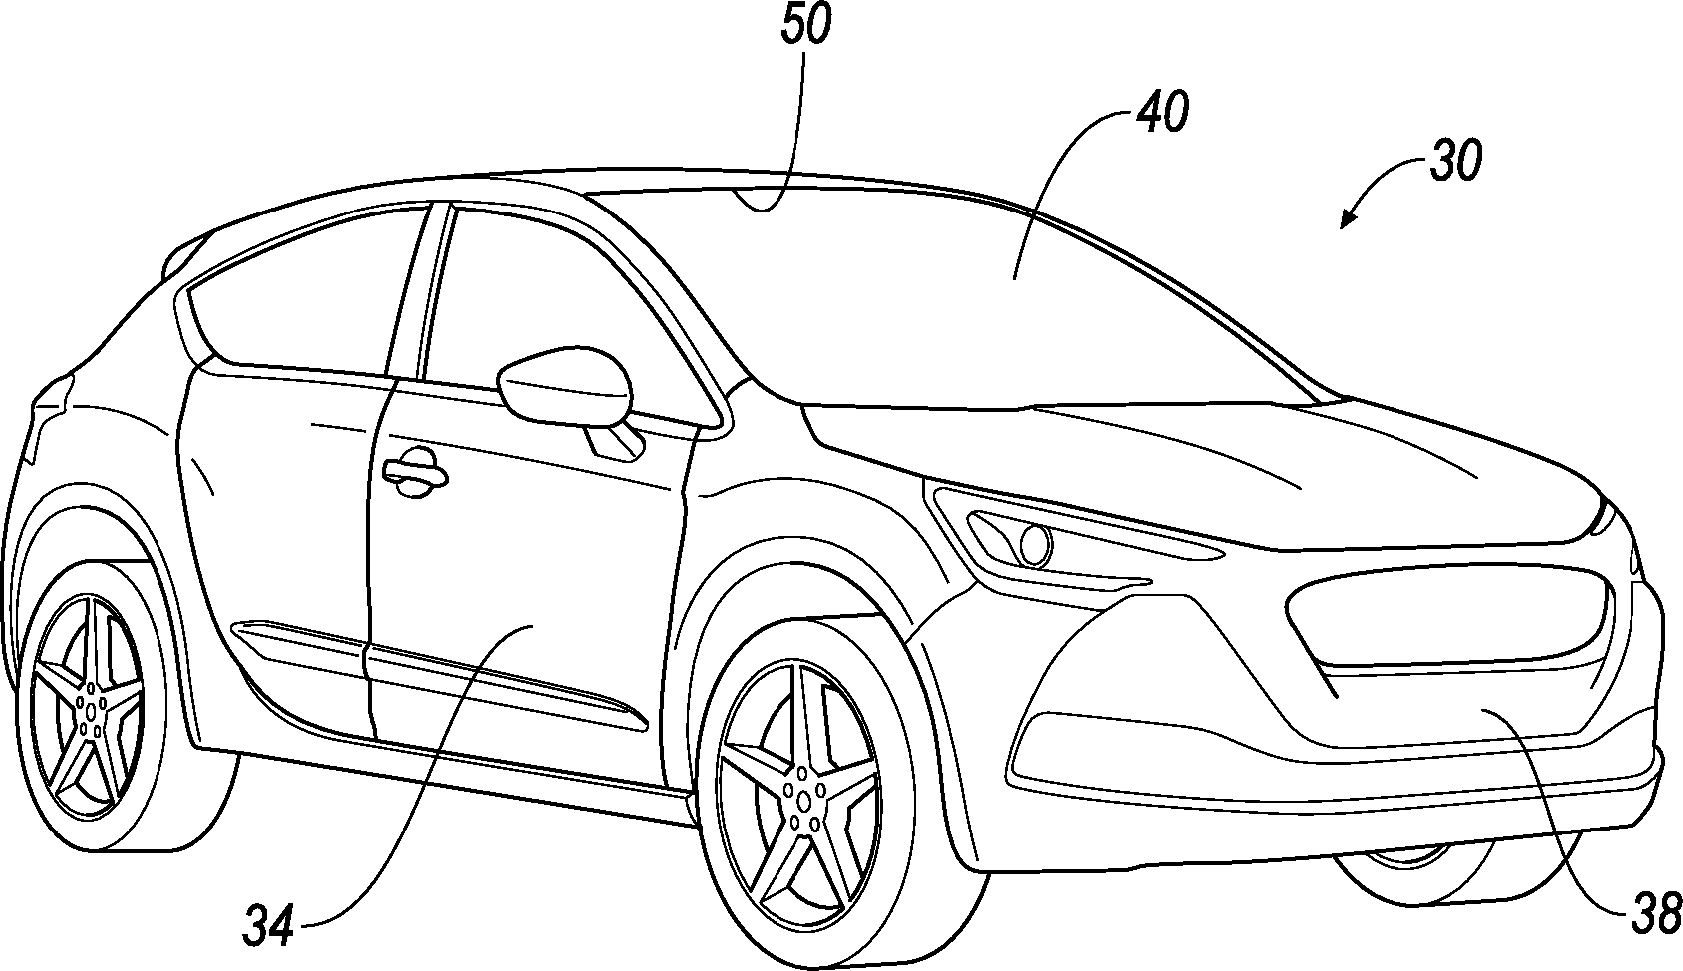 Figure GB2553647A_D0002